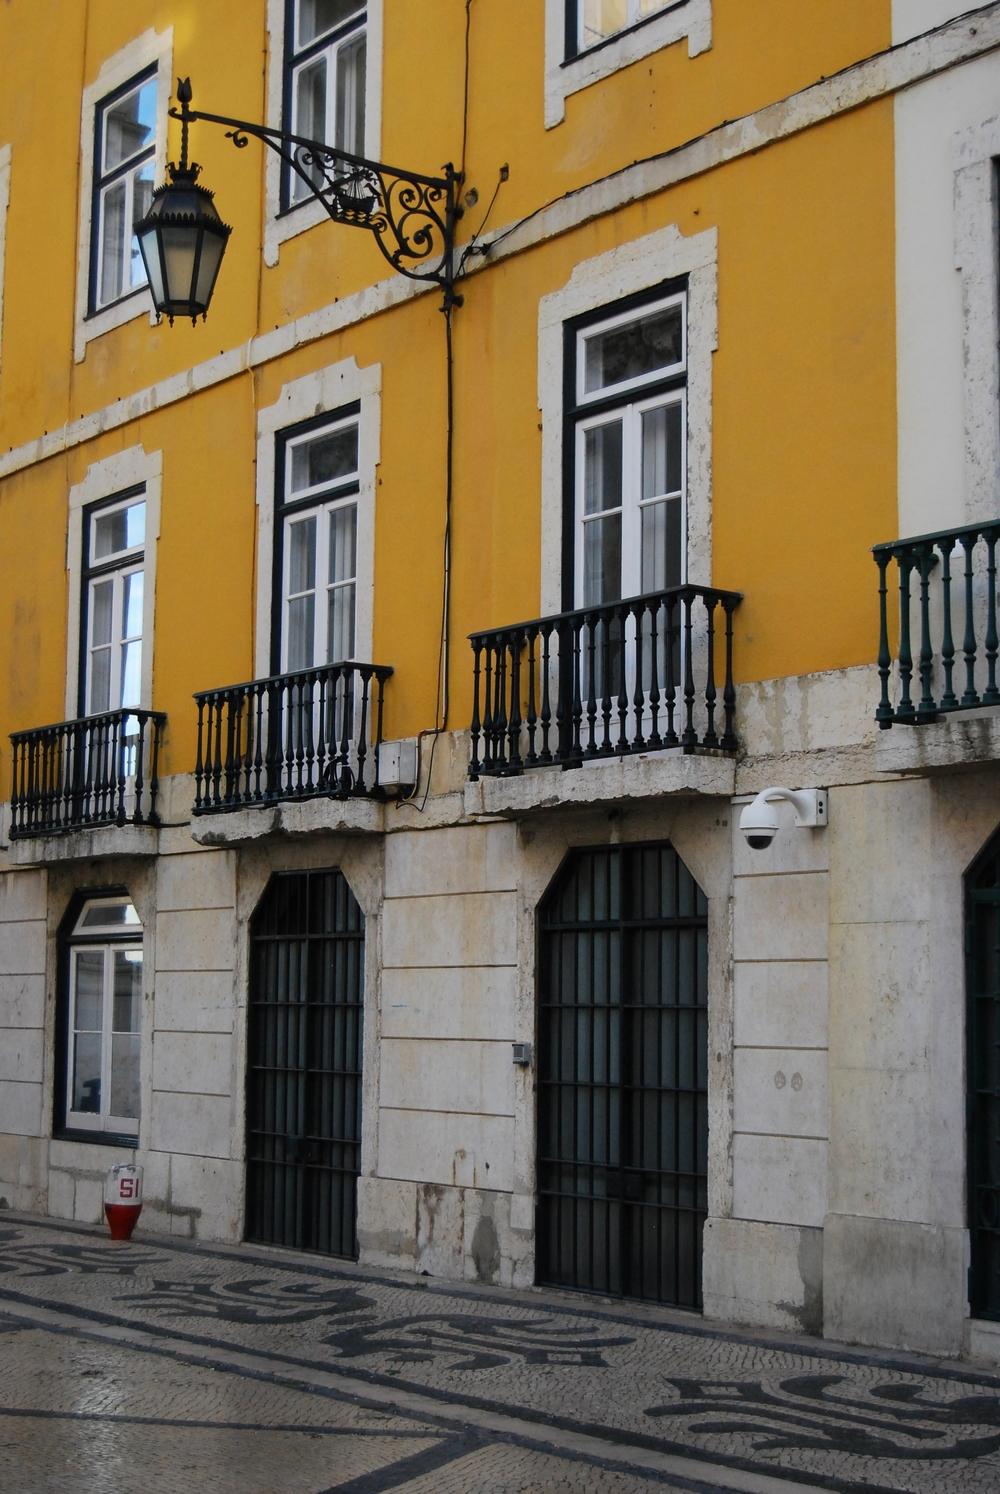 Lison, Portugal  www.ohmightycoffee.com